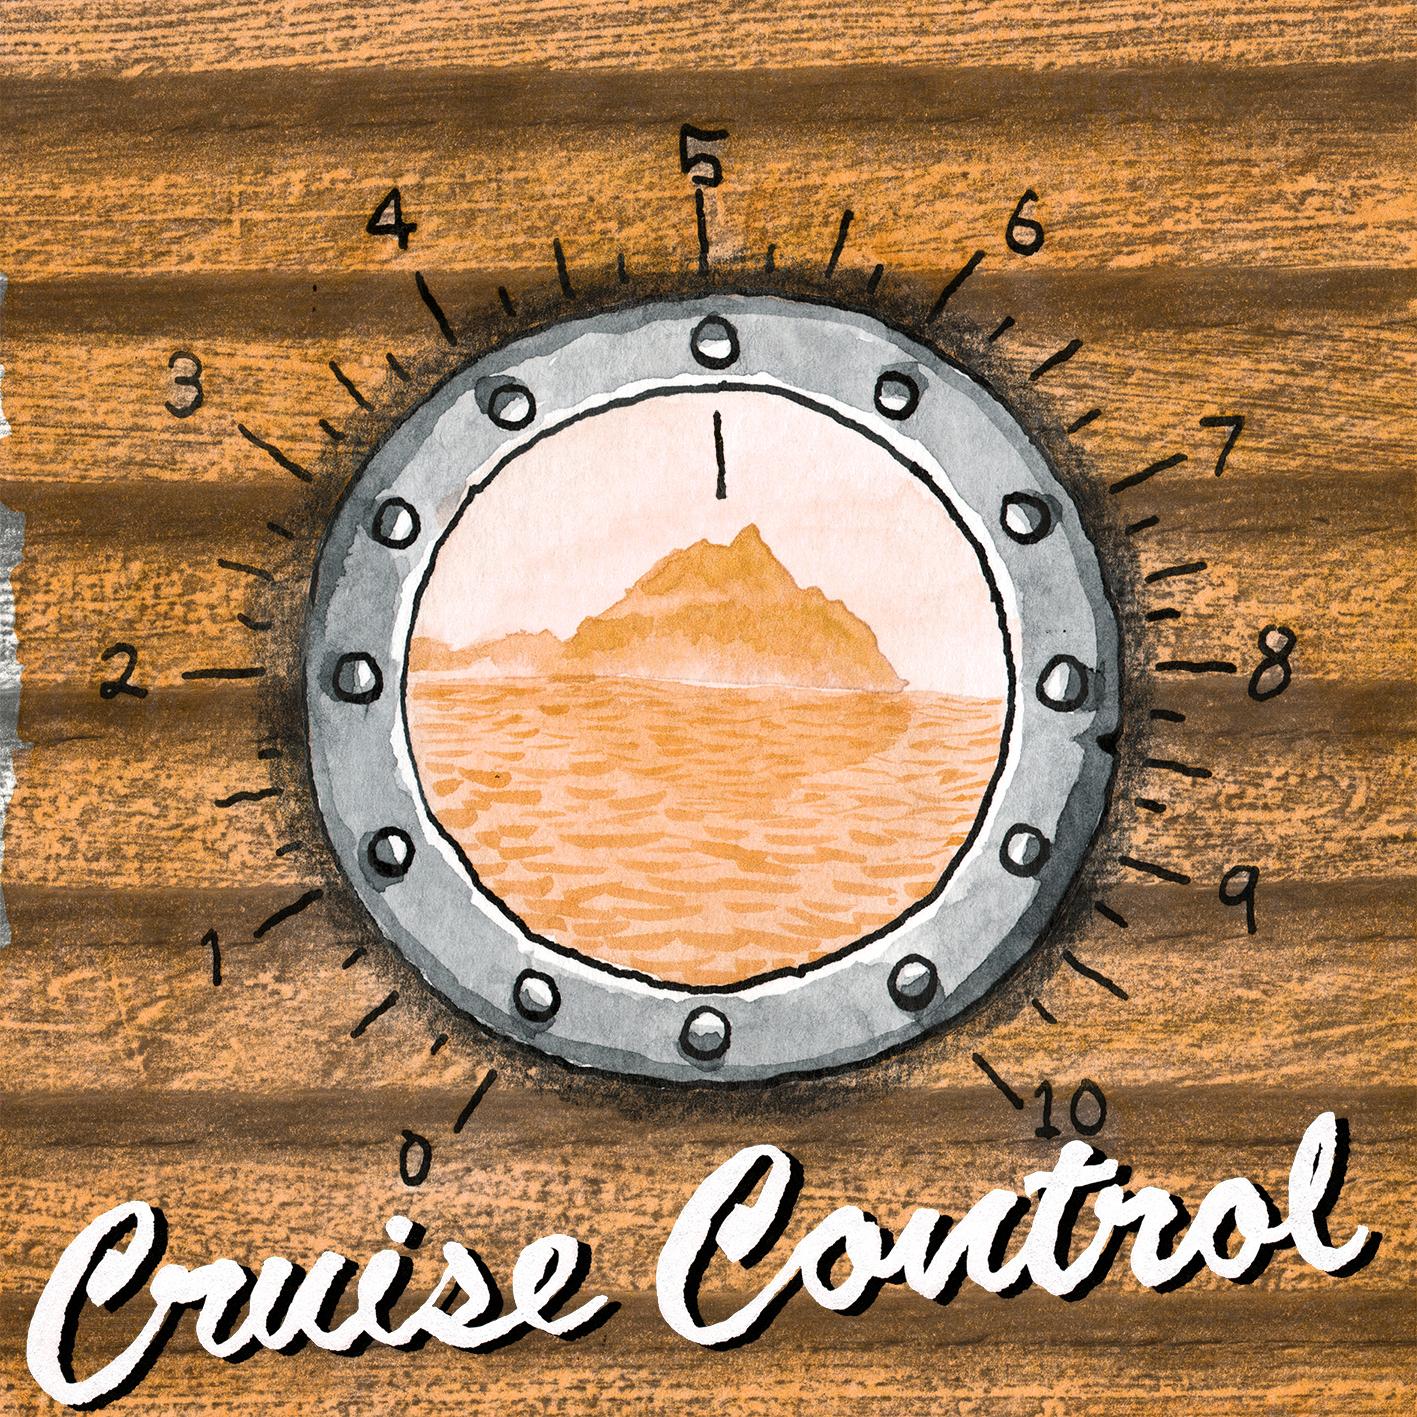 CruiseControlVol2.jpg